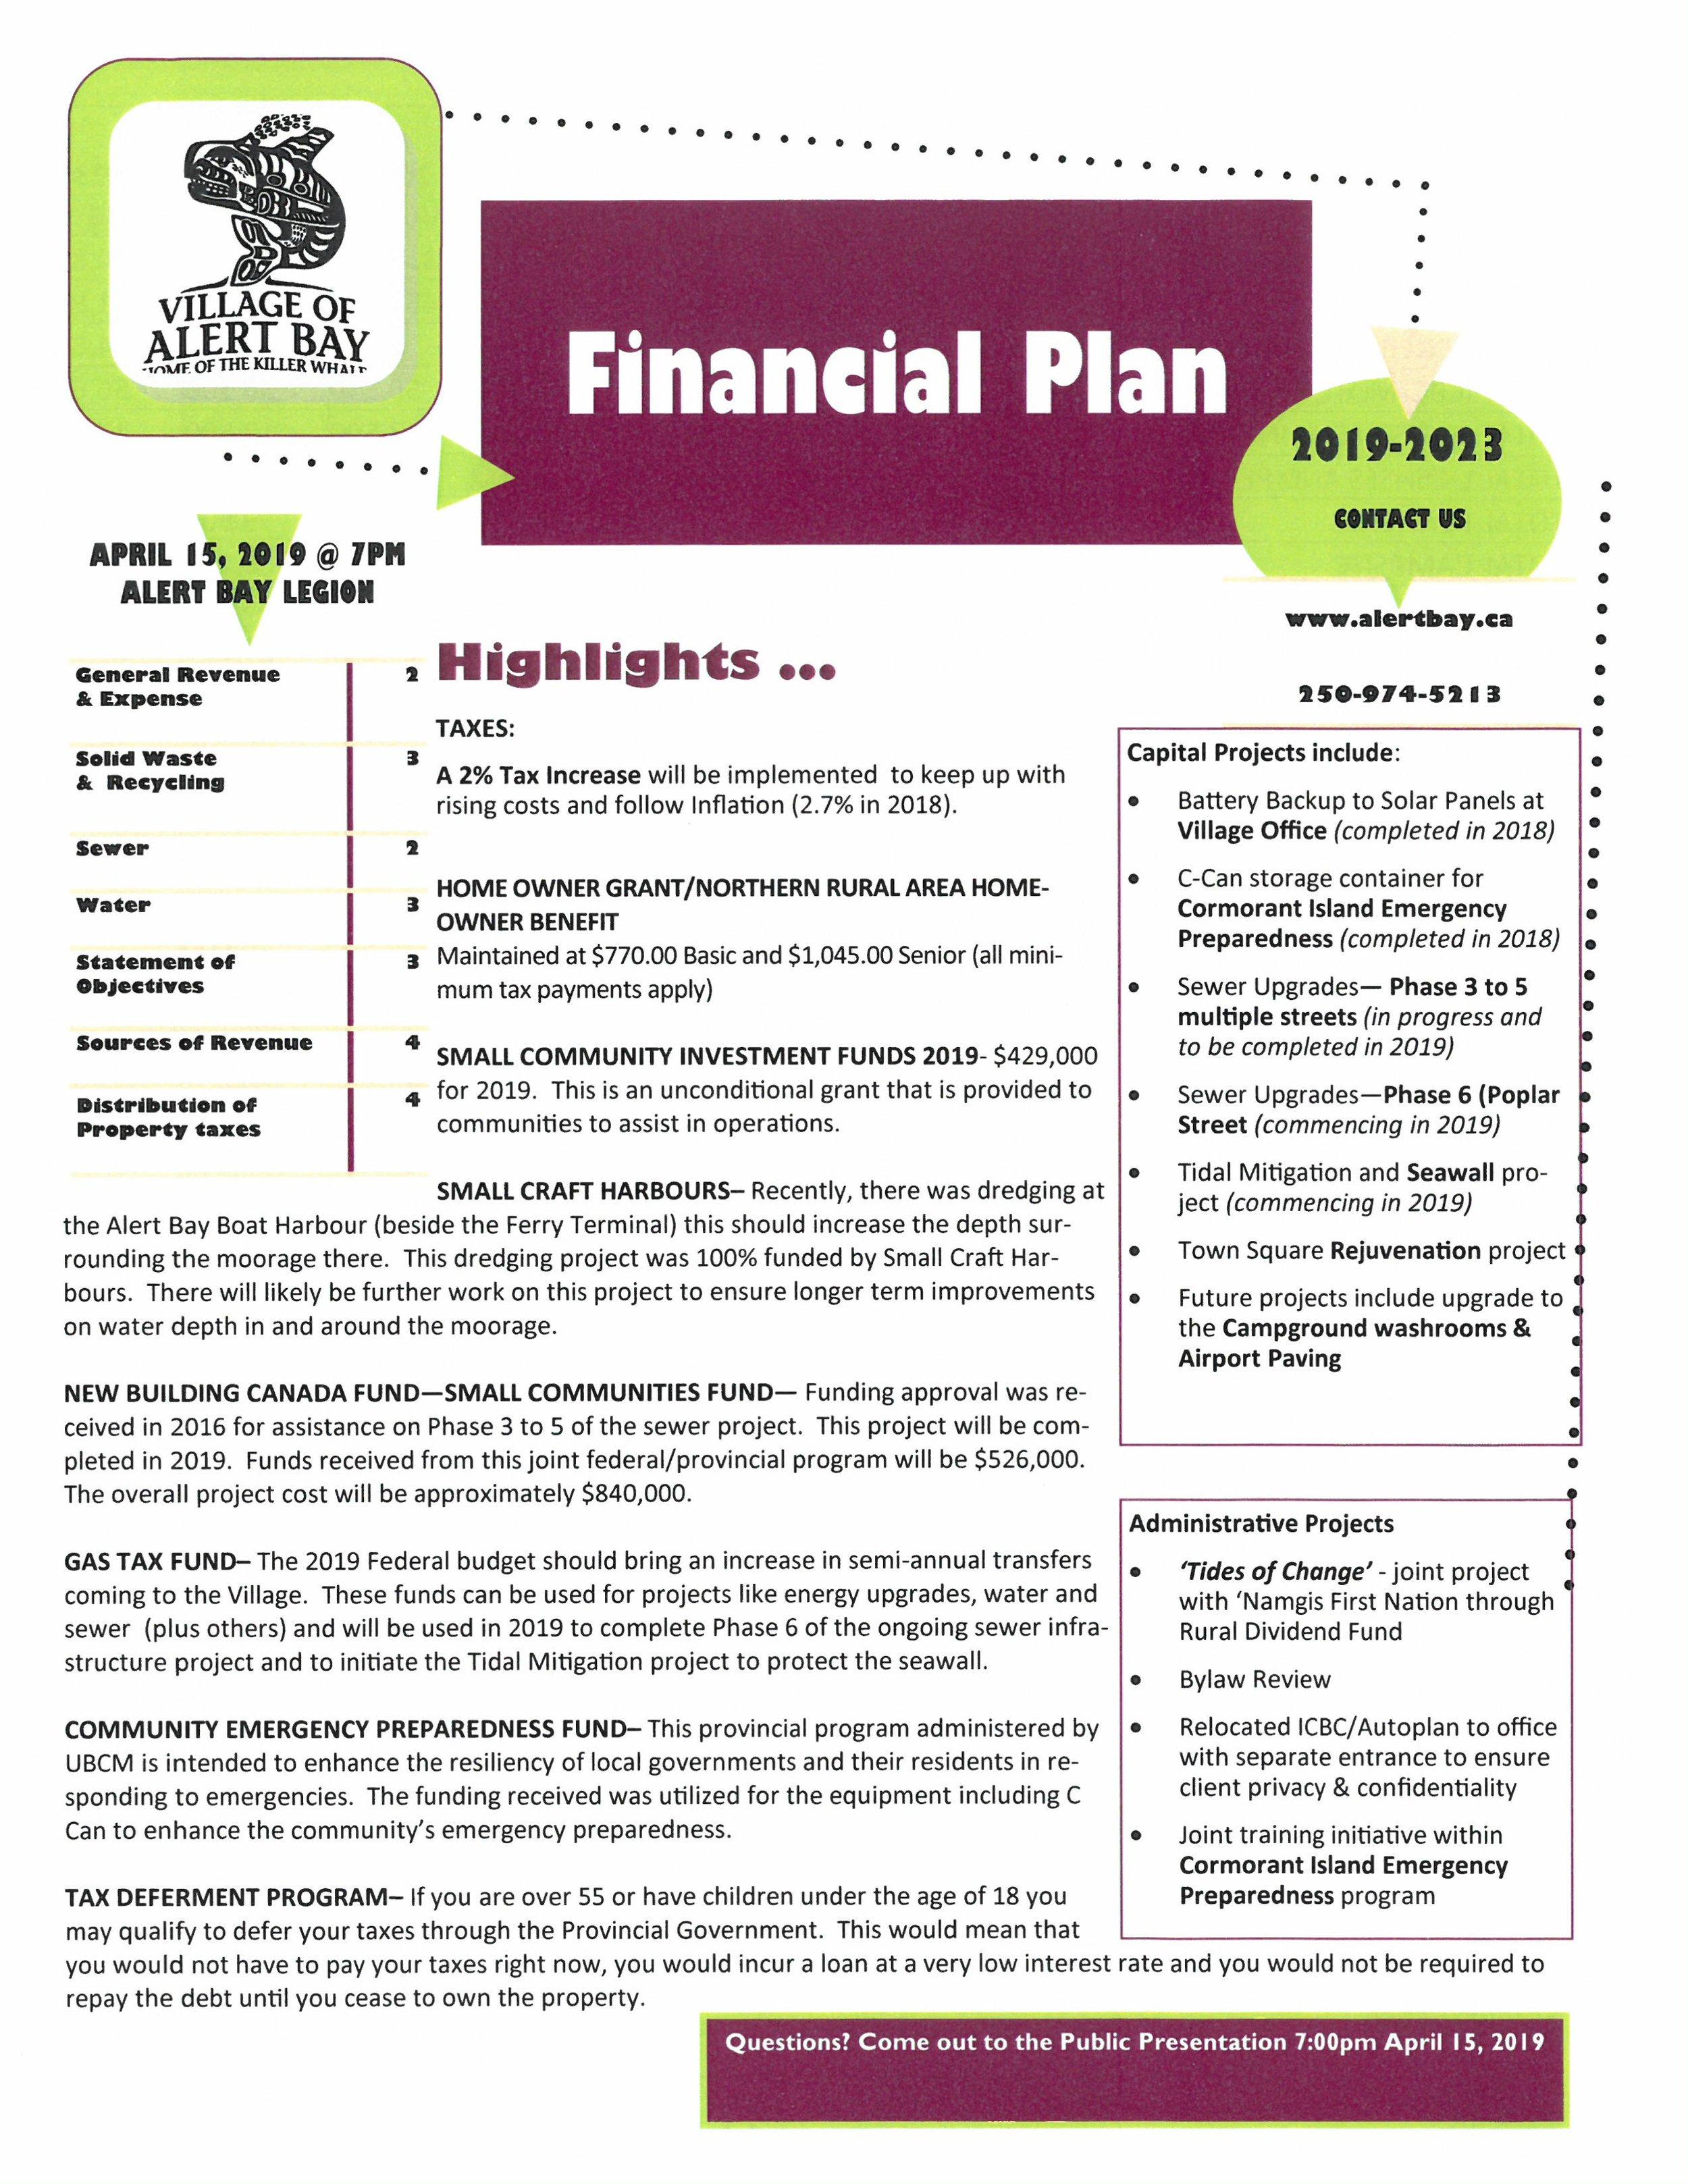 VOAB Financial Plan.jpg